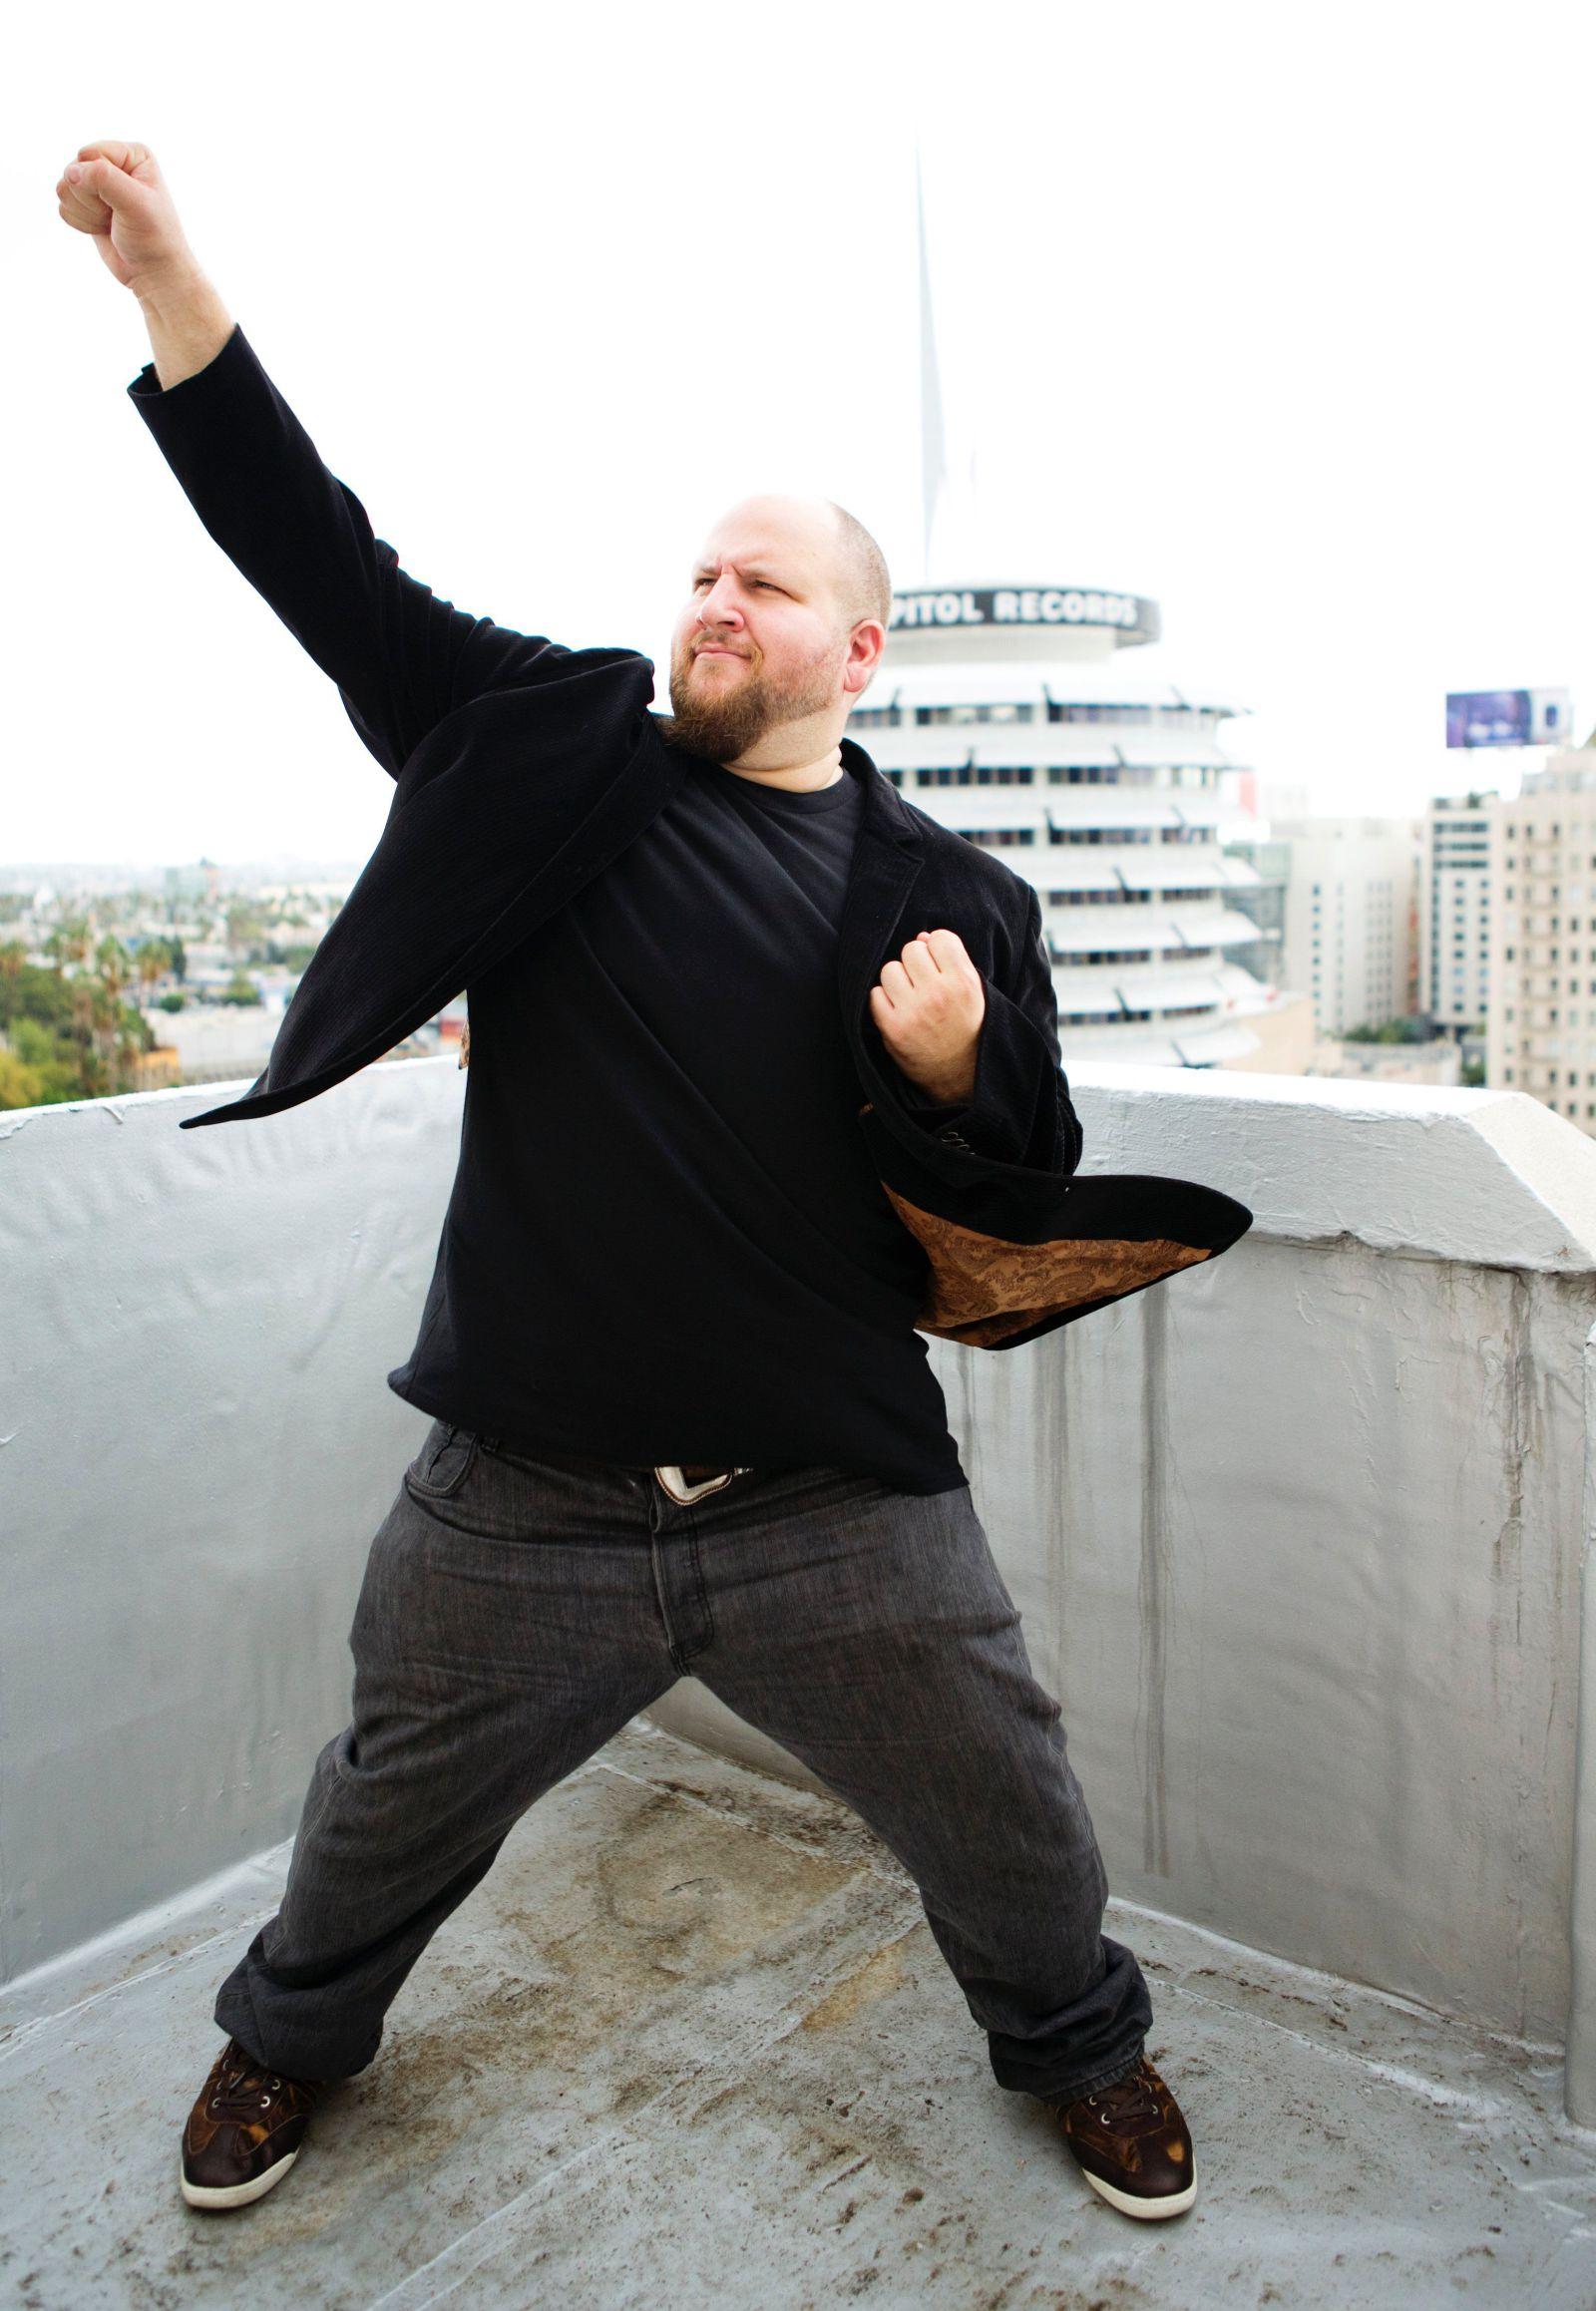 Stephen strikes a pose